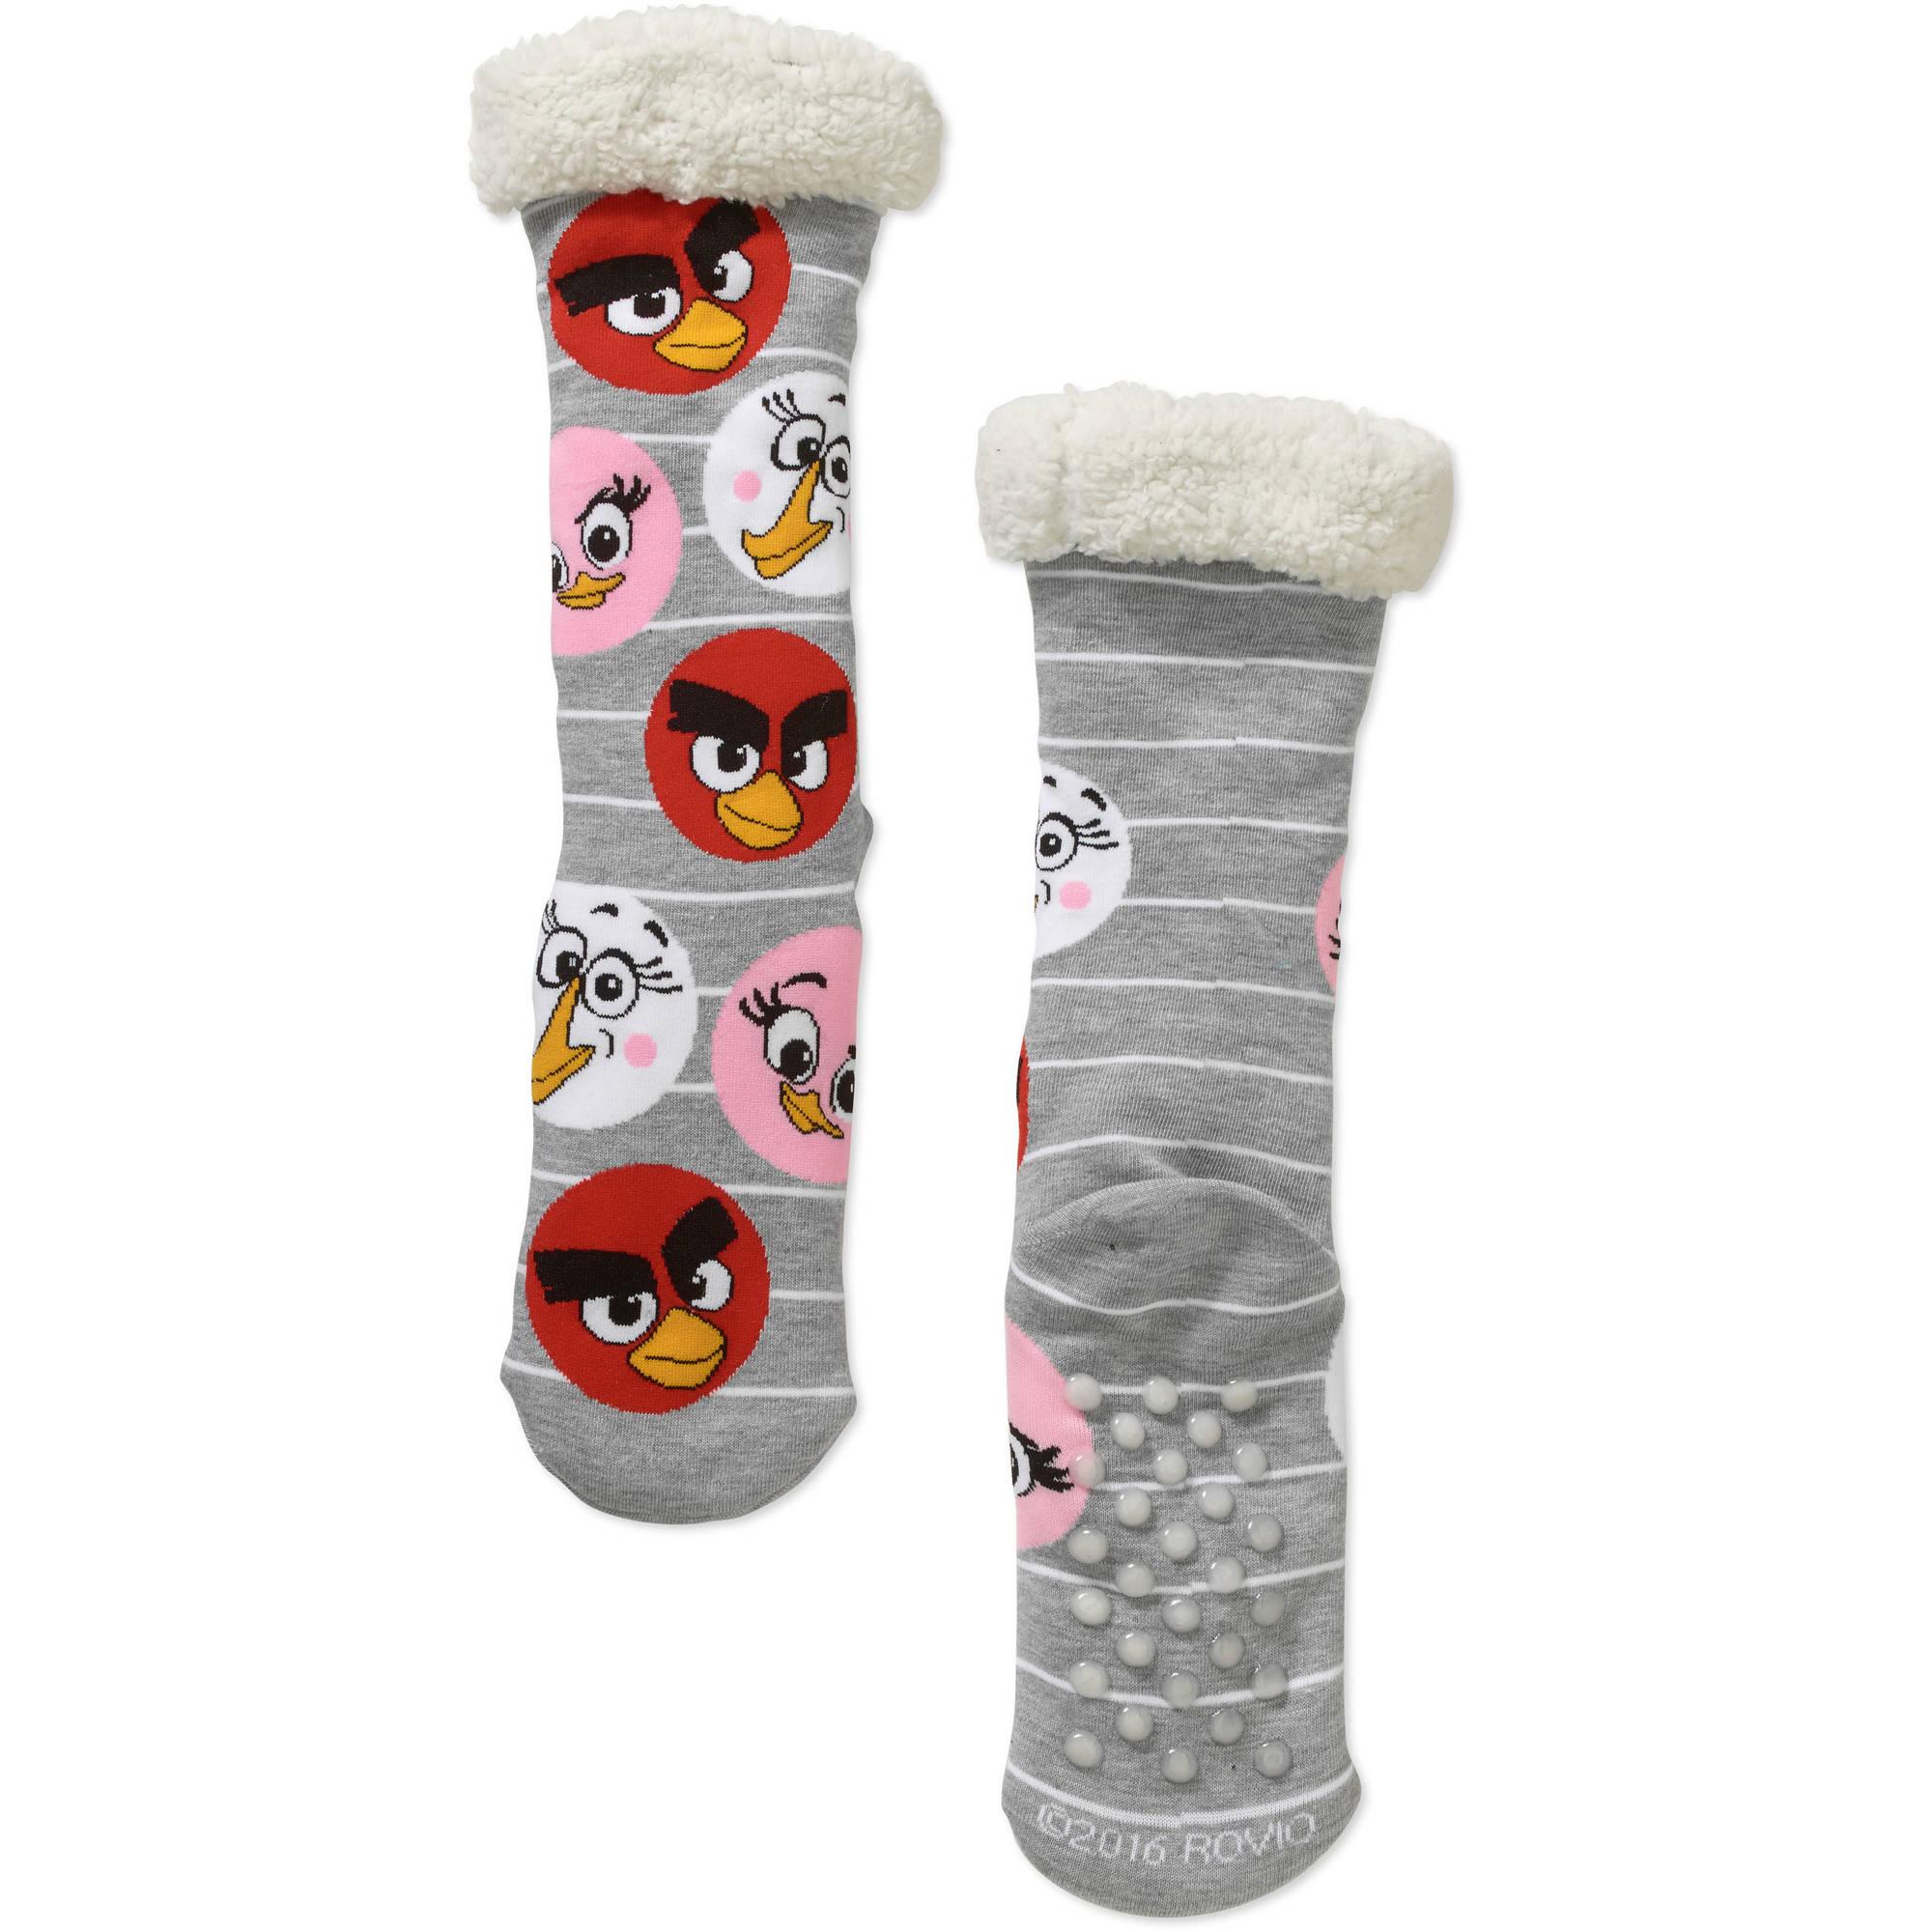 FuzzSox Angry Birds Knit Crew Socks